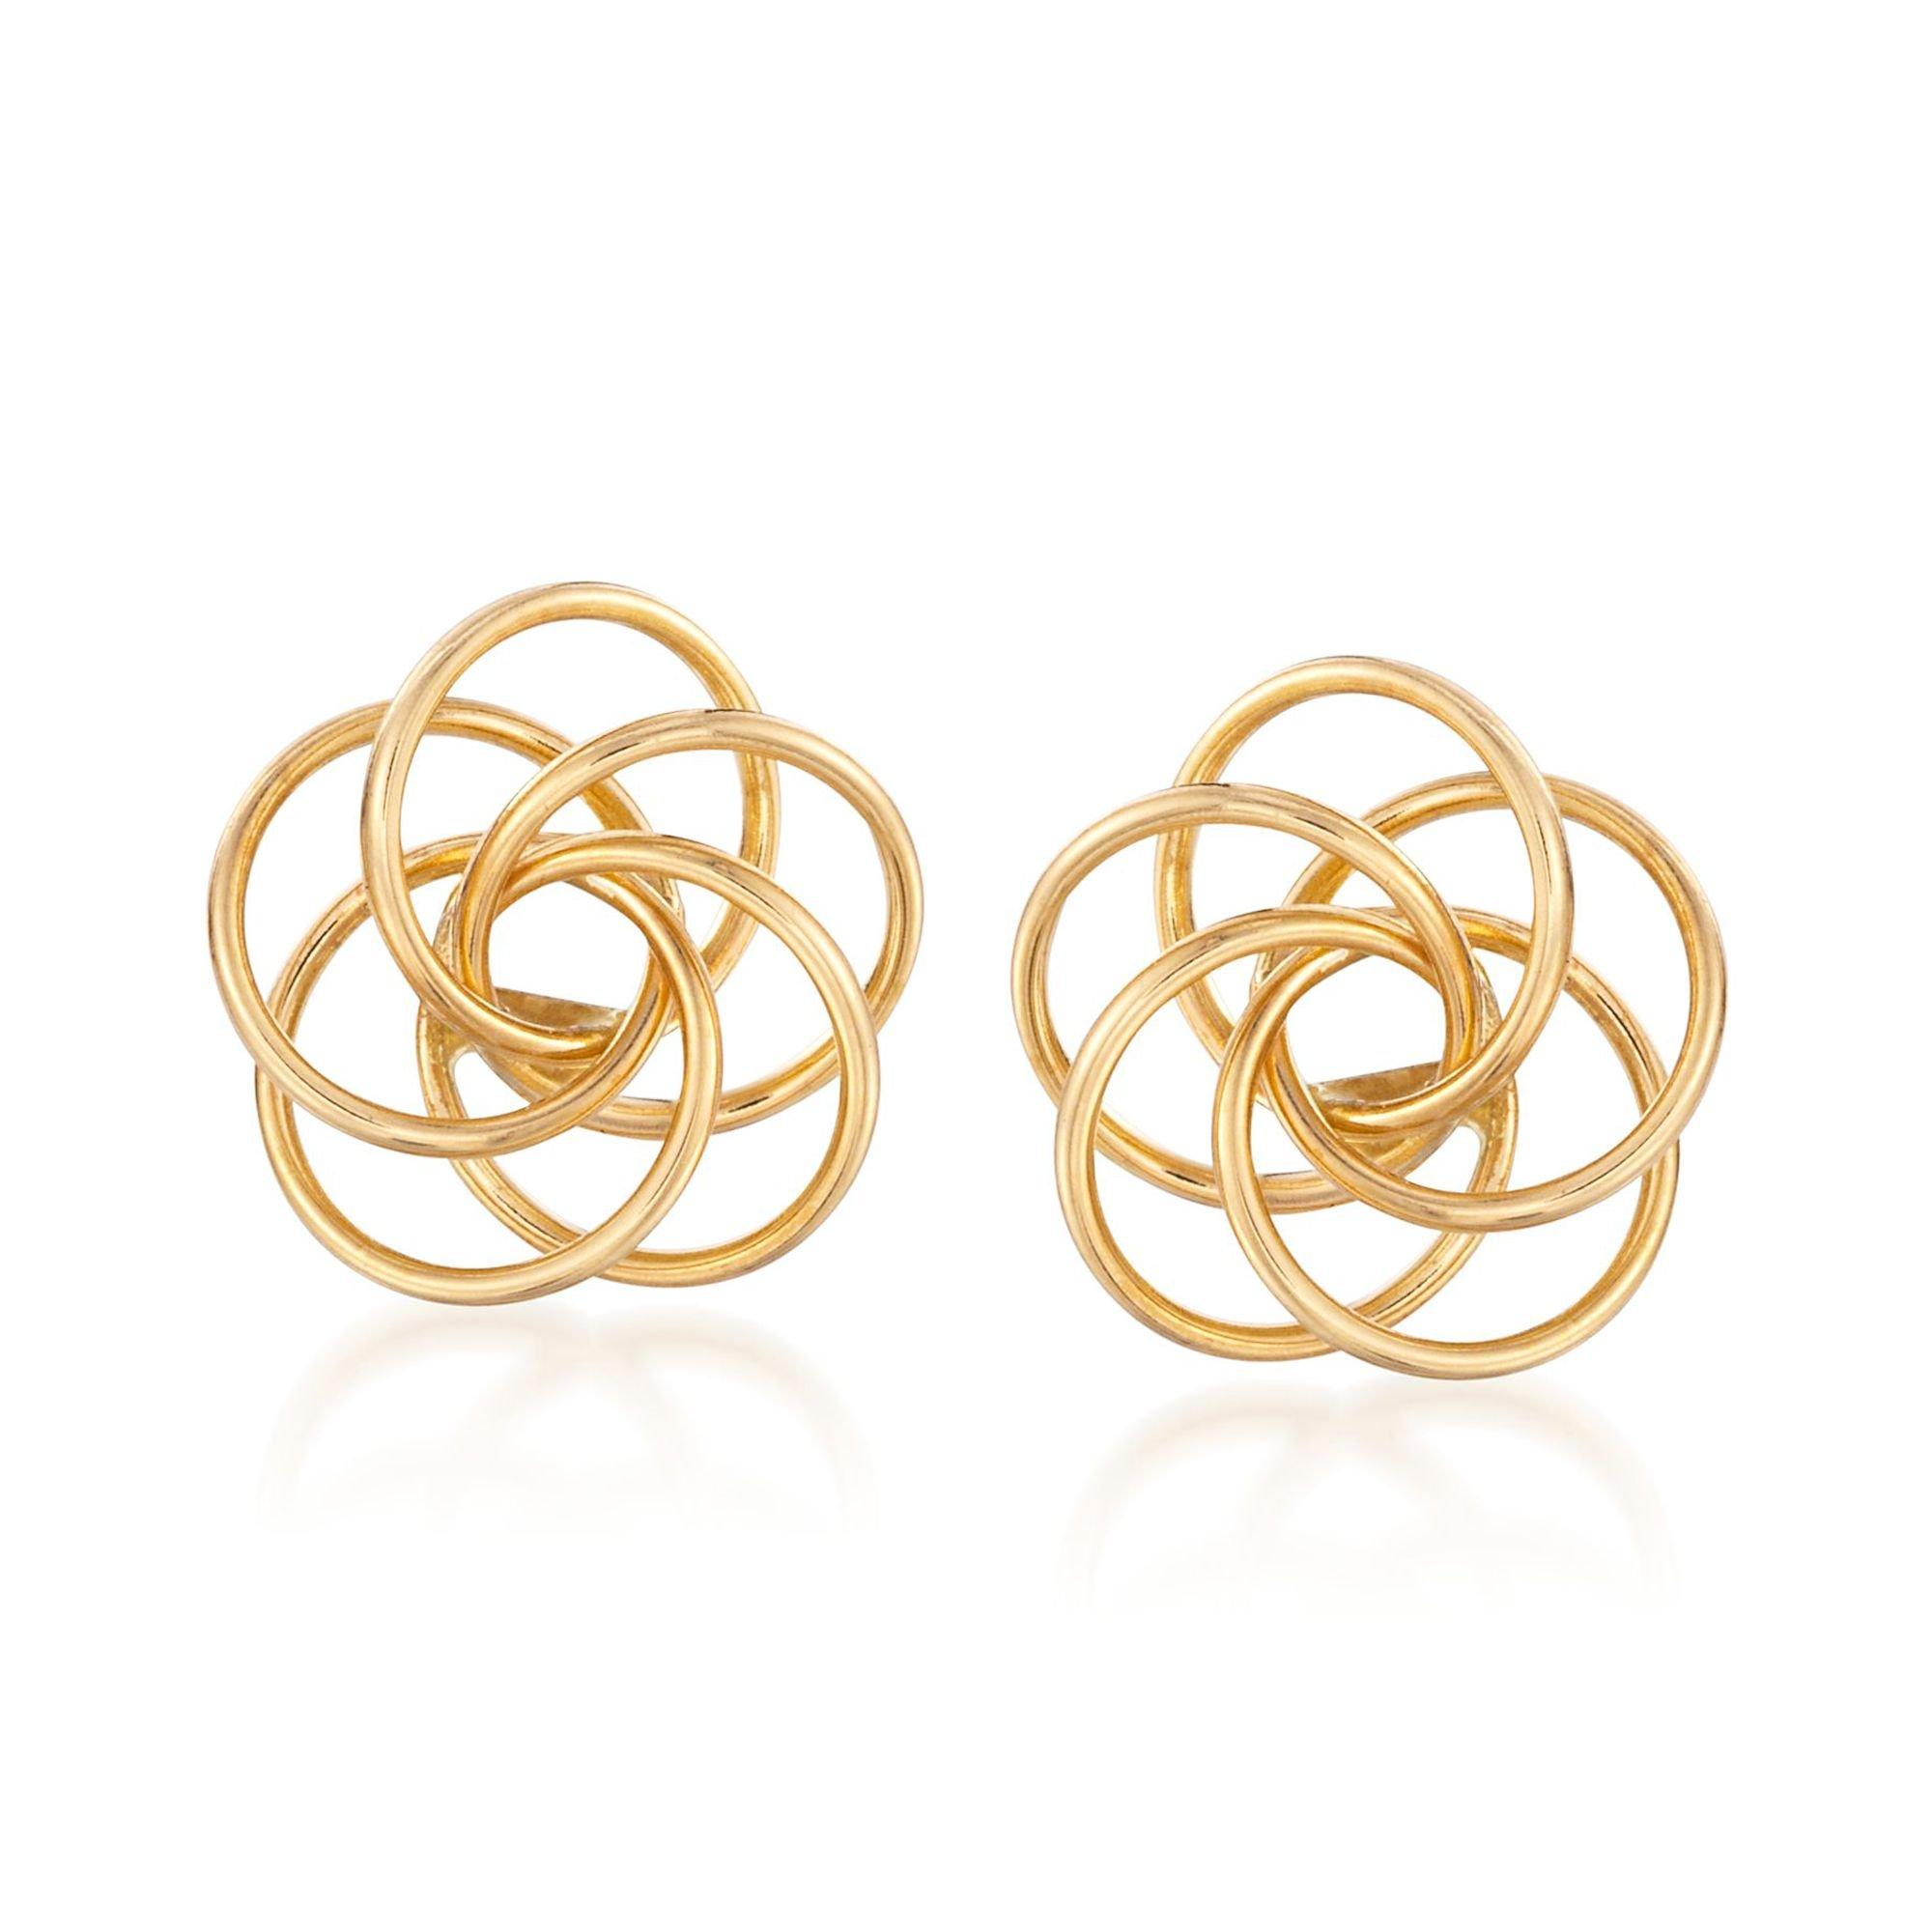 Ross-Simons 14kt Yellow Gold Open Knot Earring Jackets